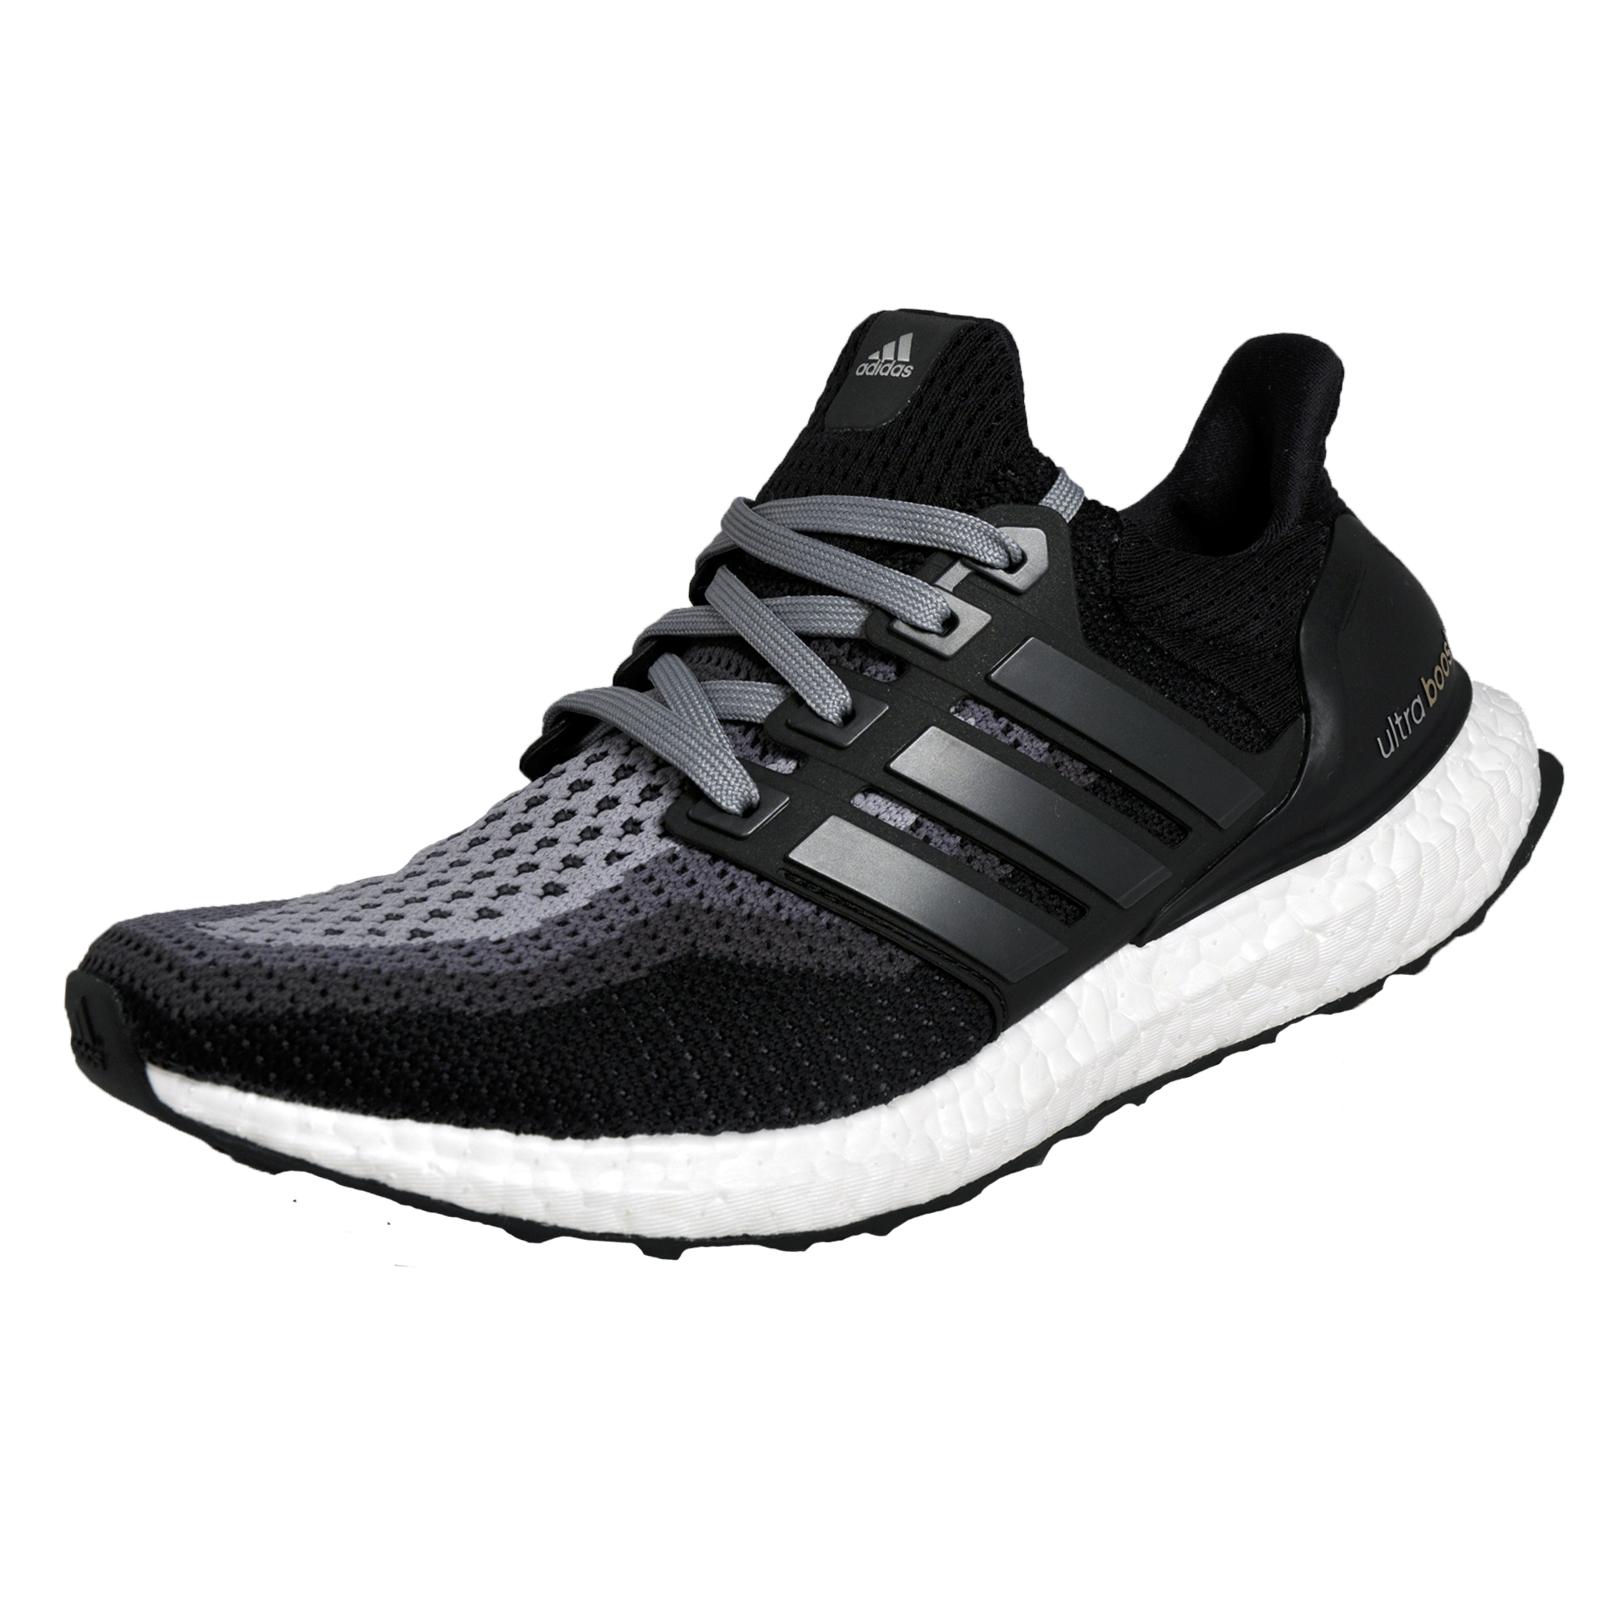 Adidas Ultra Boost Primeknit Mens Running Shoes Fitness ...